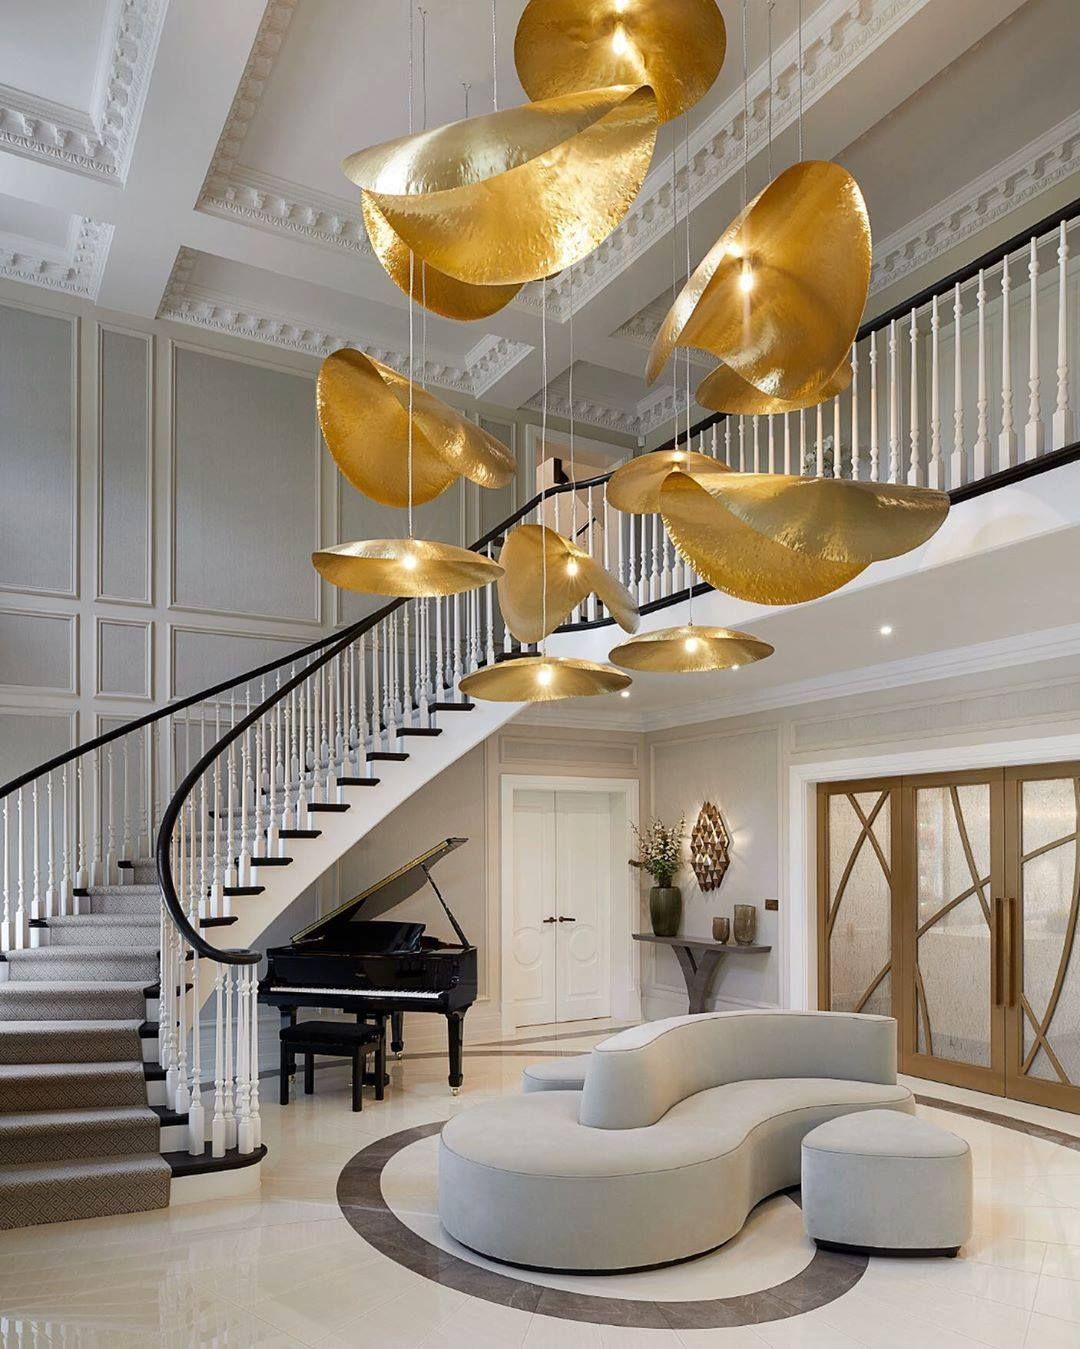 Gervasoni Isle Of Man With Images Interior Design London